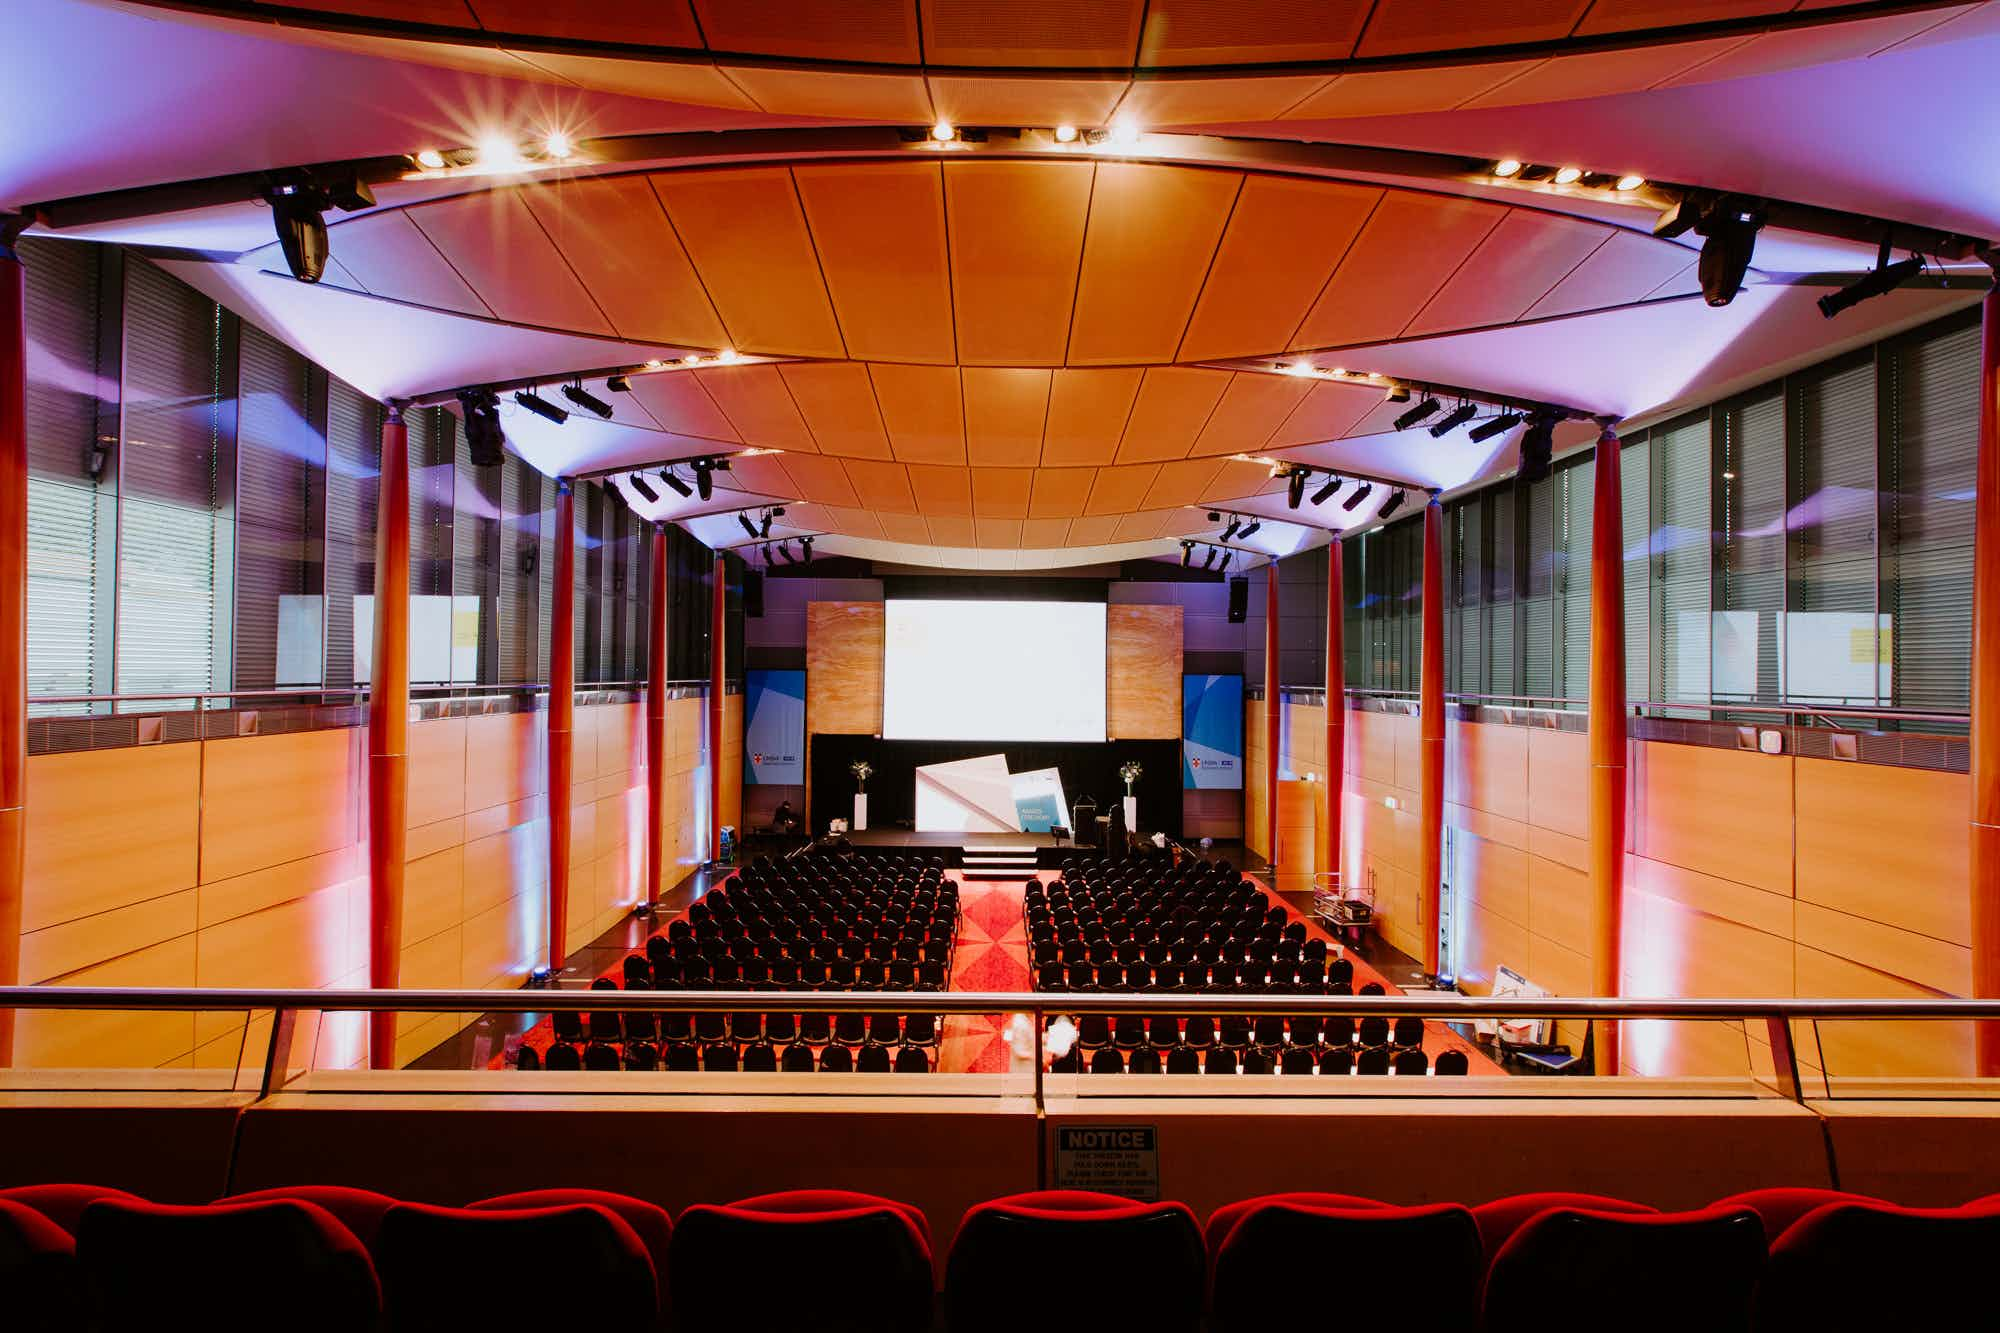 Leighton Hall, John Niland Scientia Building